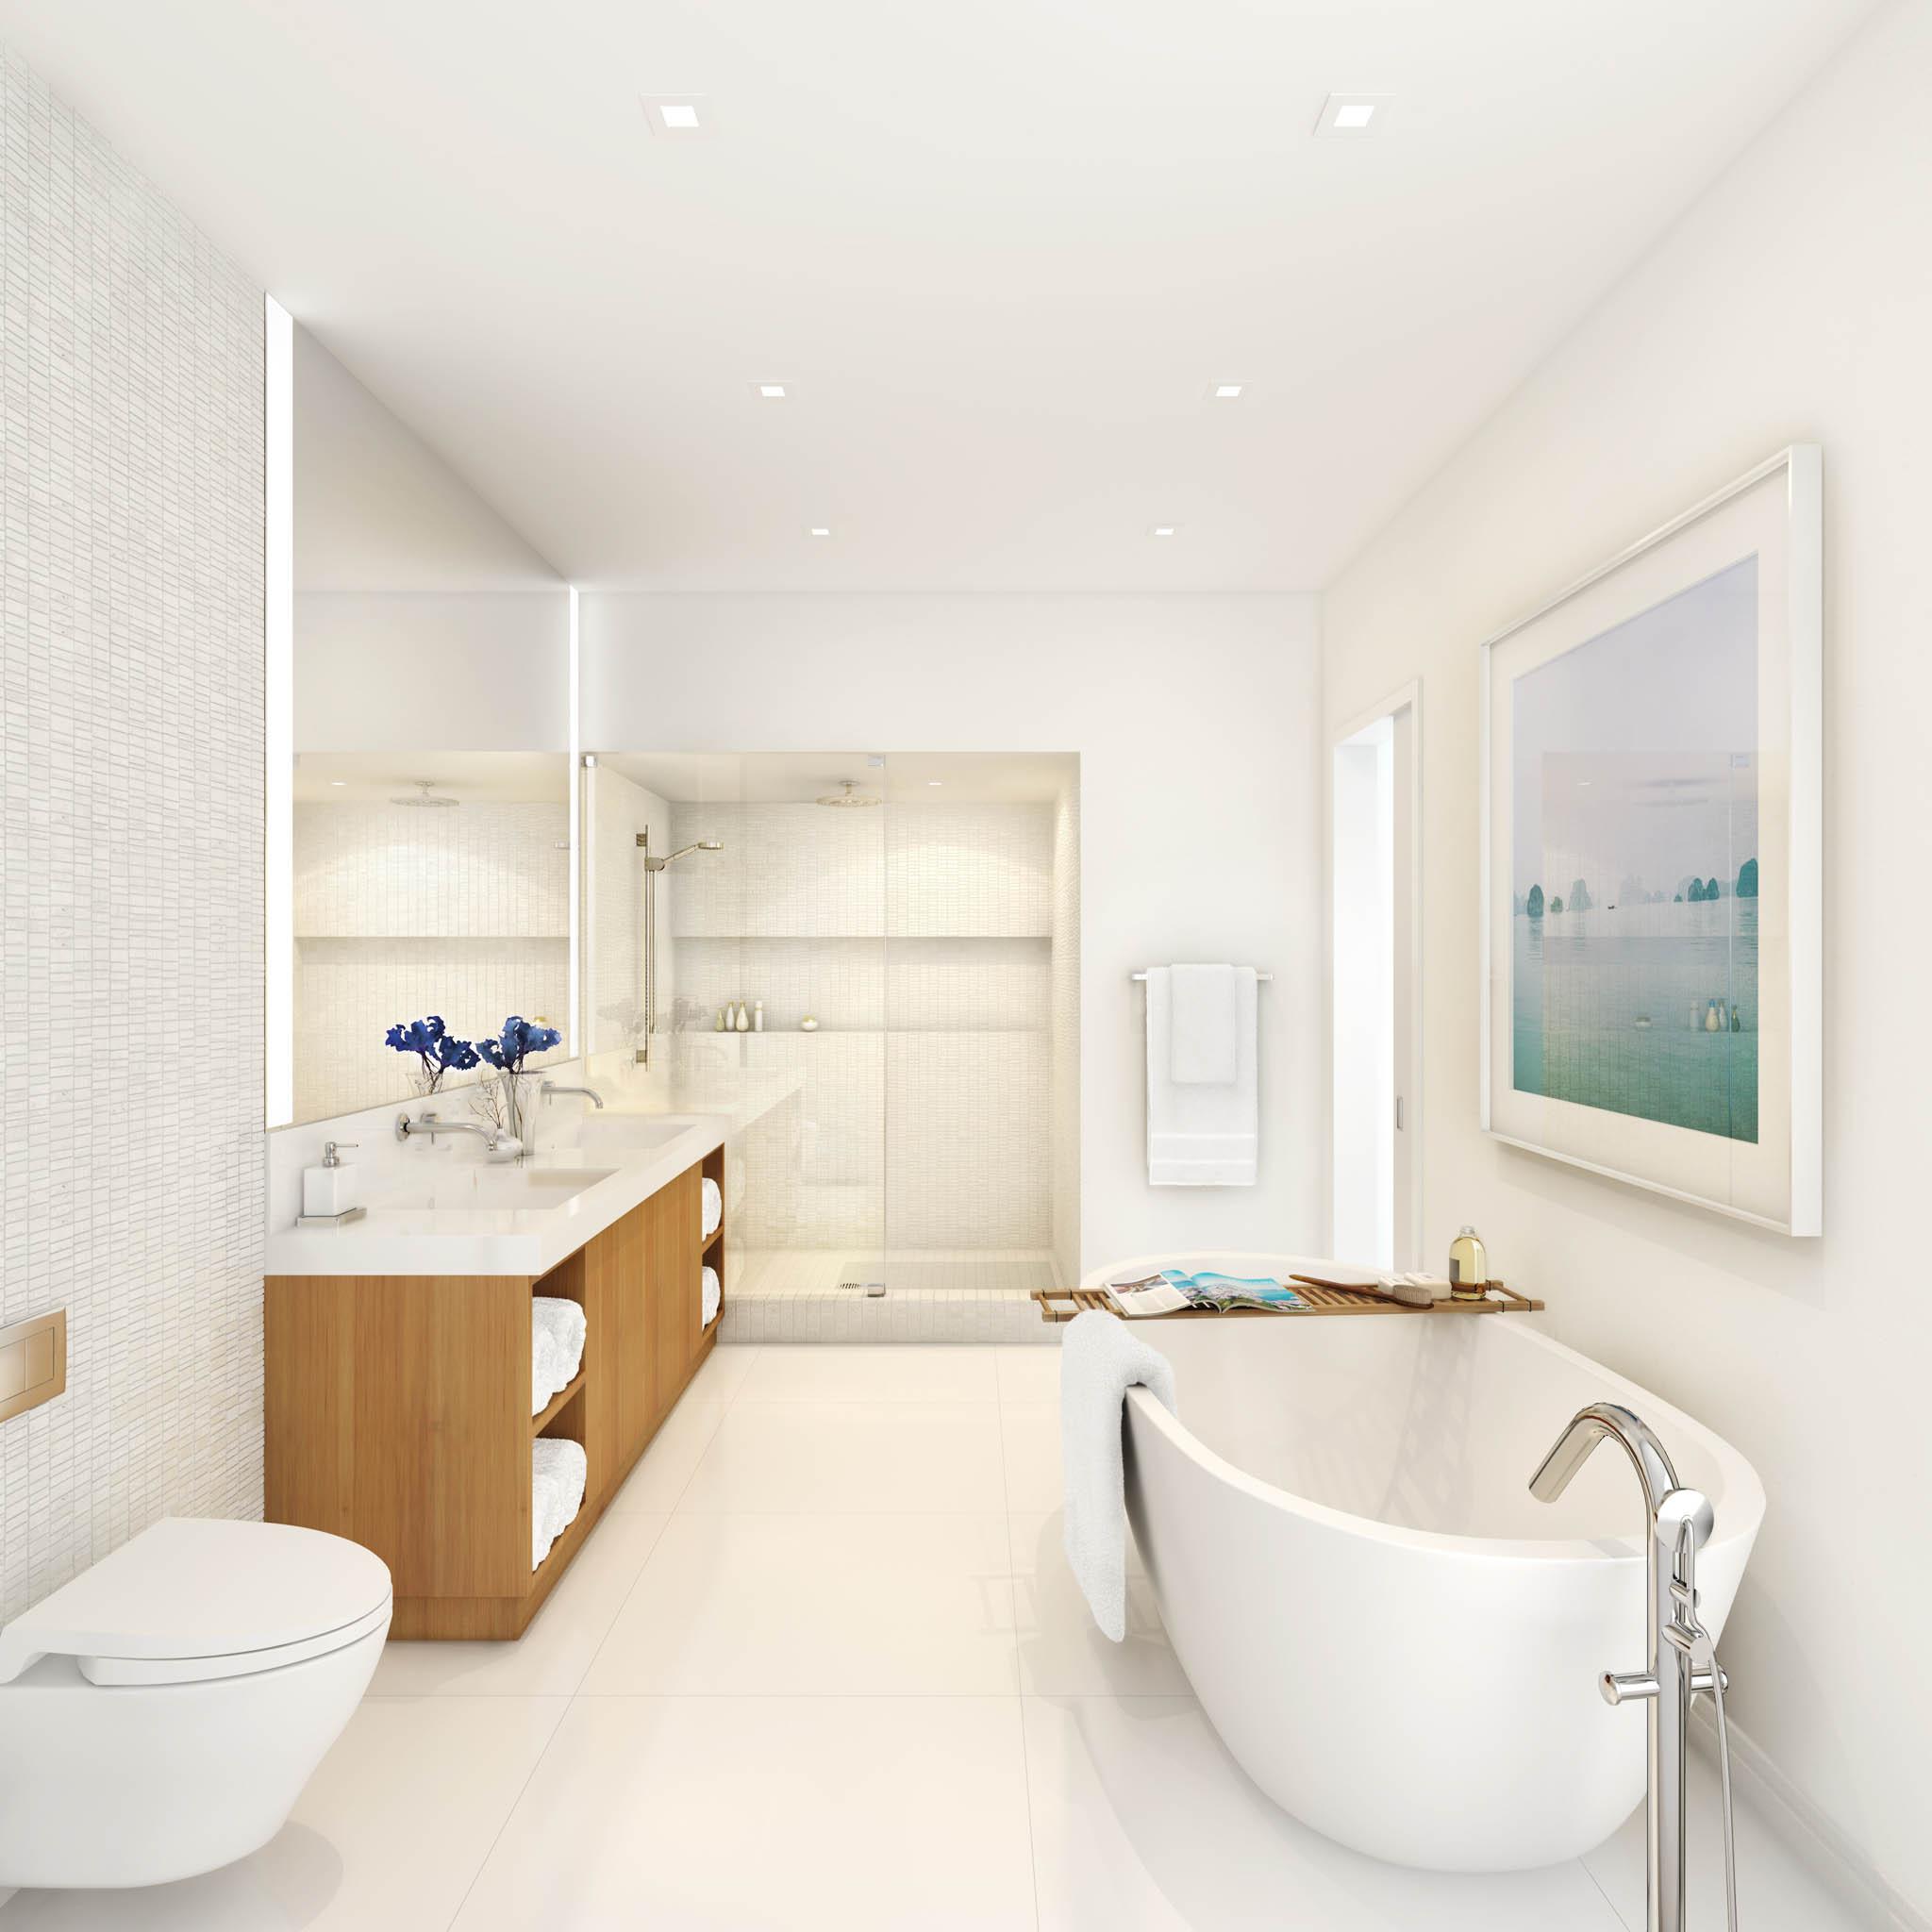 S400_Bathroom_Final.jpg